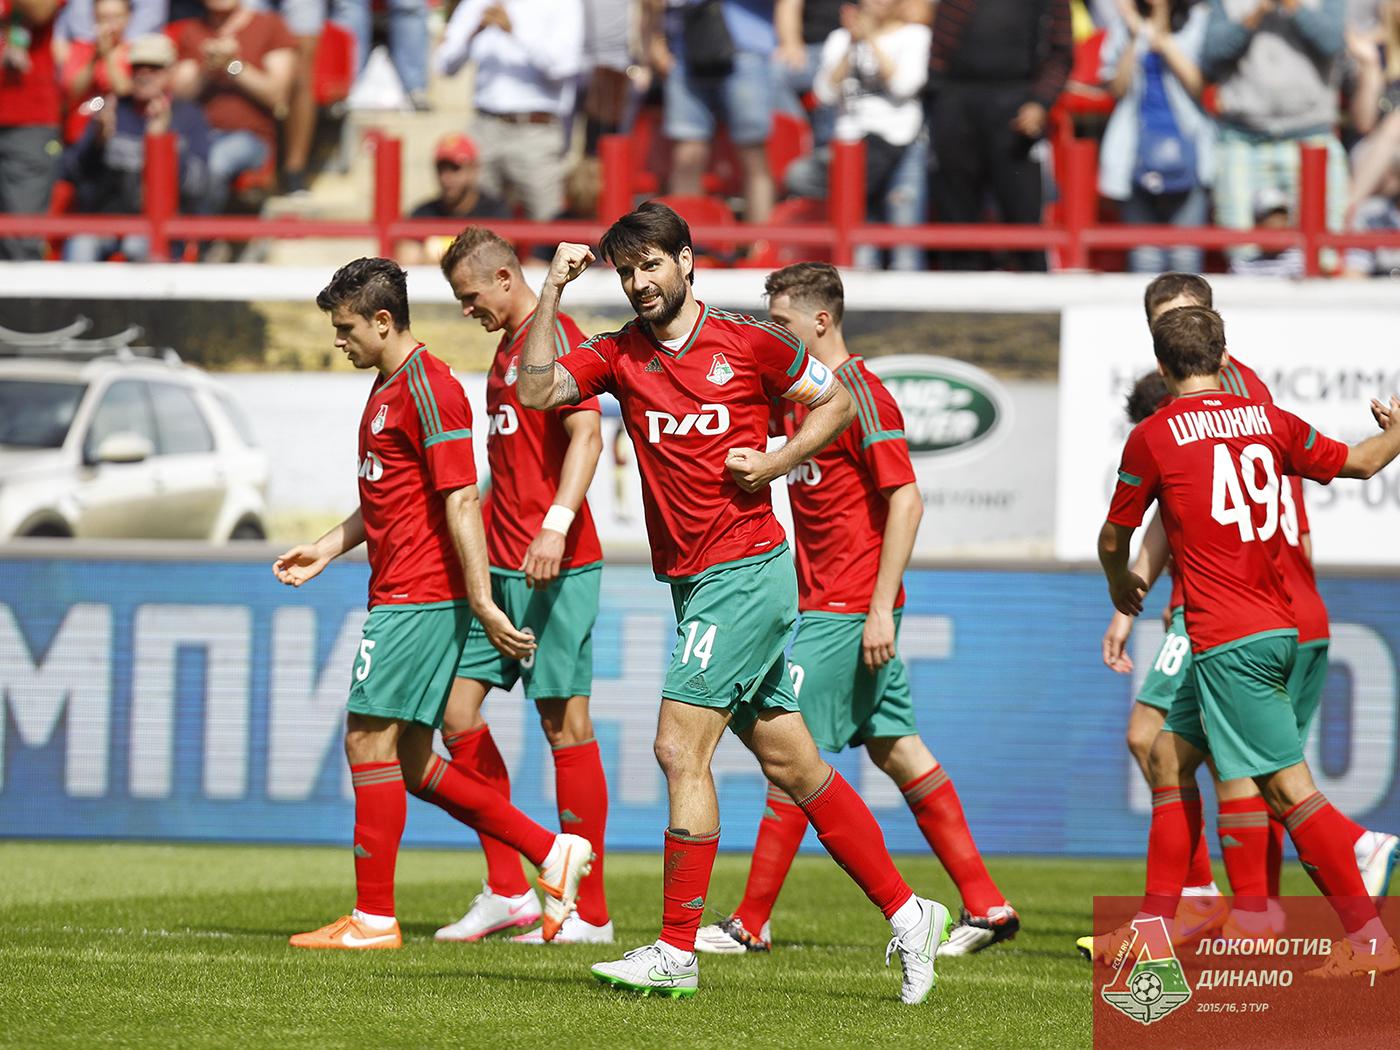 «Локомотив» - «Динамо» - 1:1